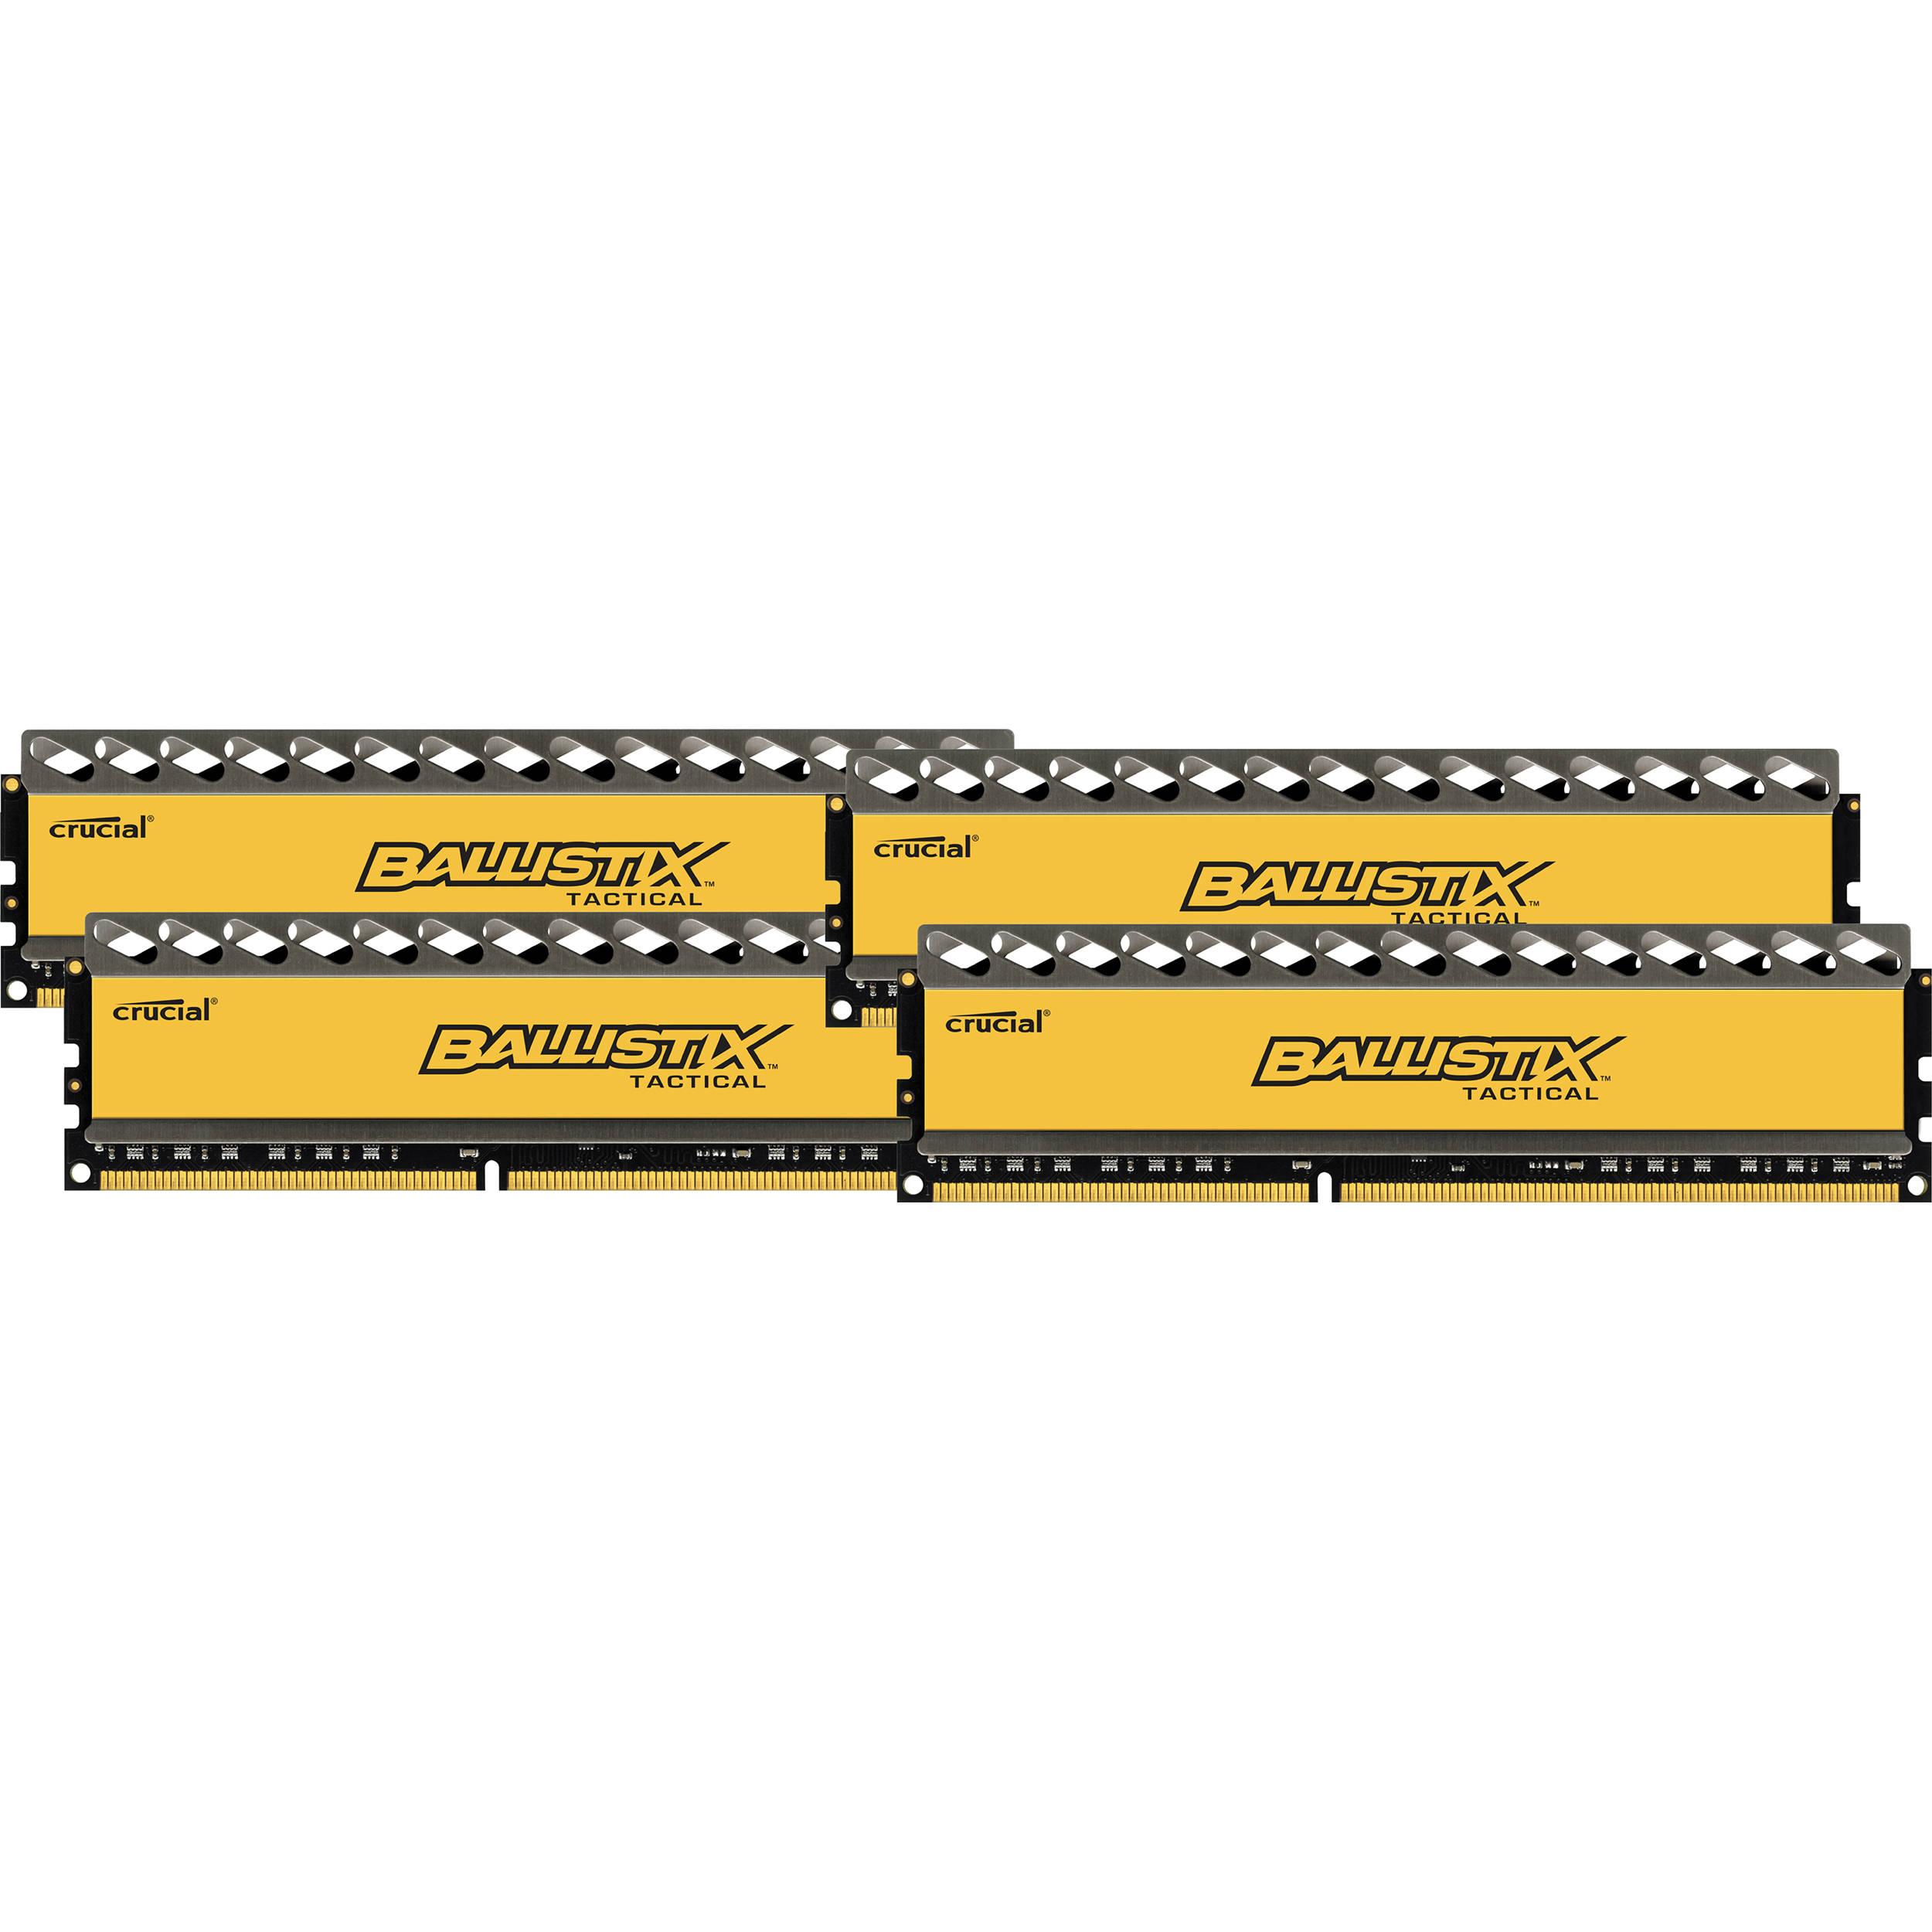 Ballistix 4GB Ballistix Tactical Series DDR3 1600 MHz UDIMM Memory Module